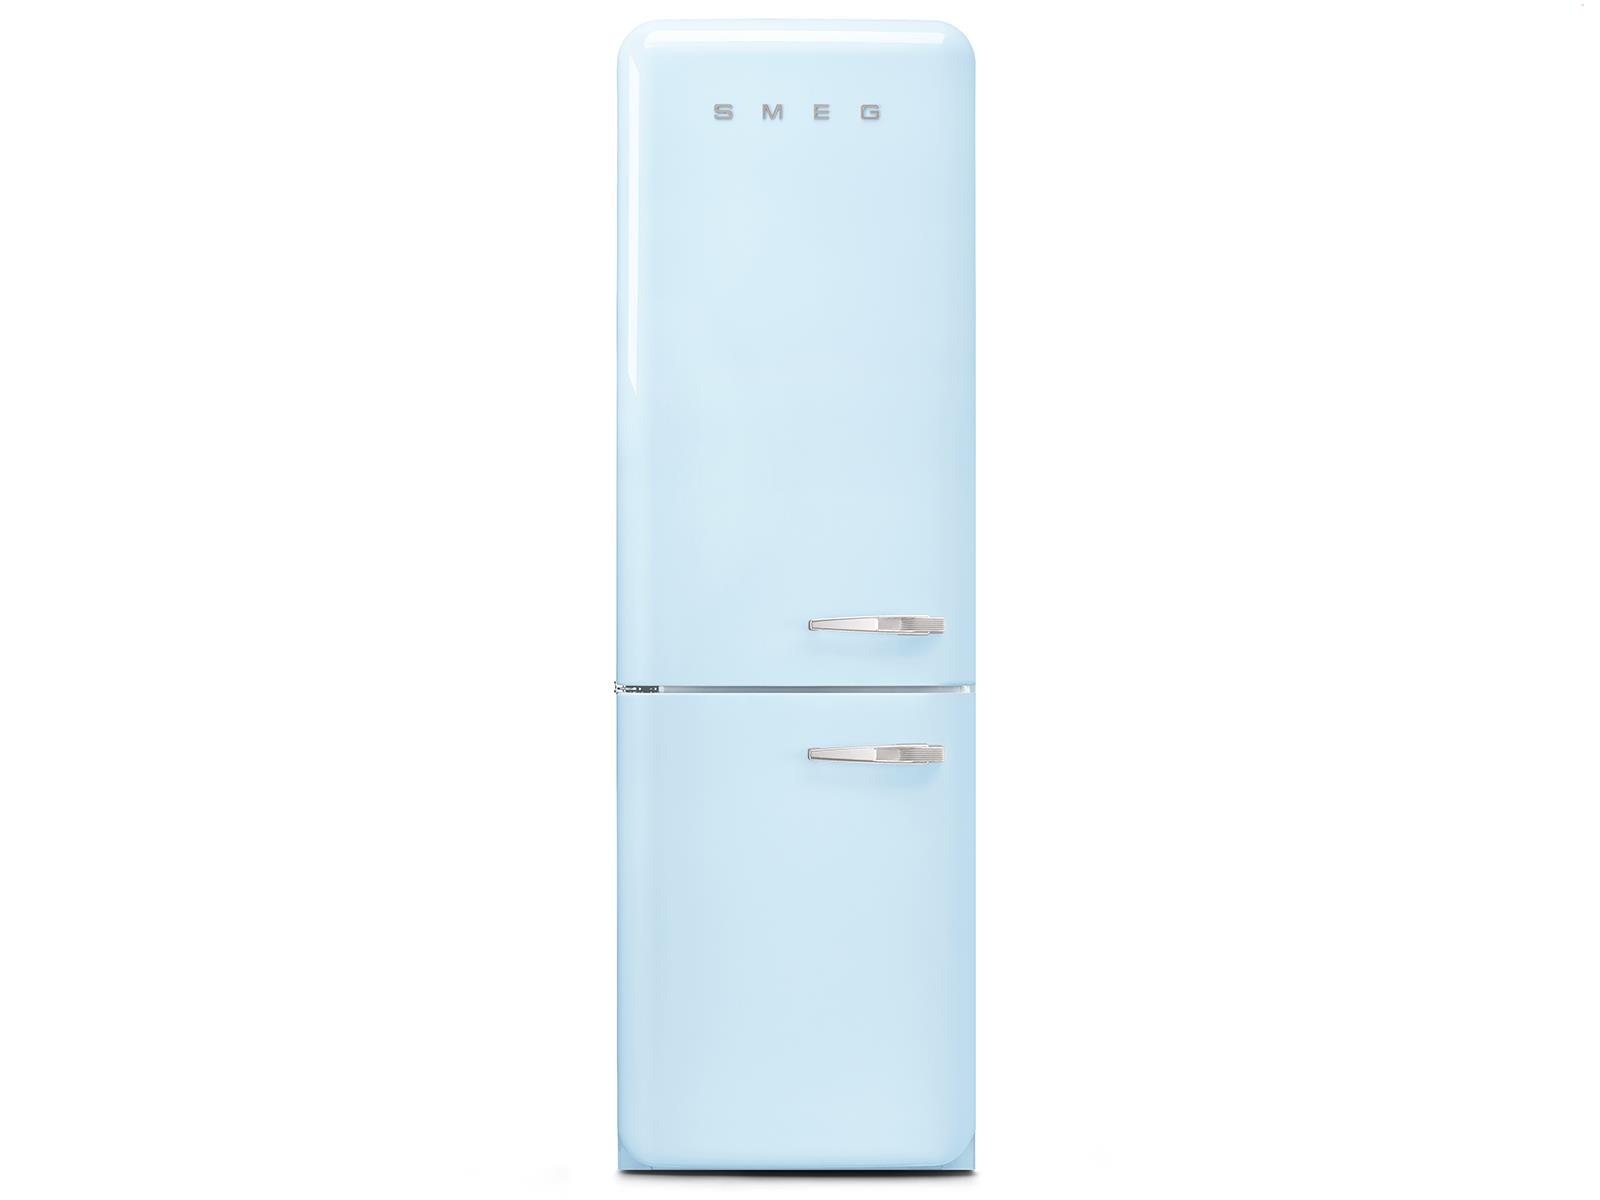 Smeg Kühlschrank Gefrierkombi : Smeg fab lpb kühl gefrierkombination pastellblau